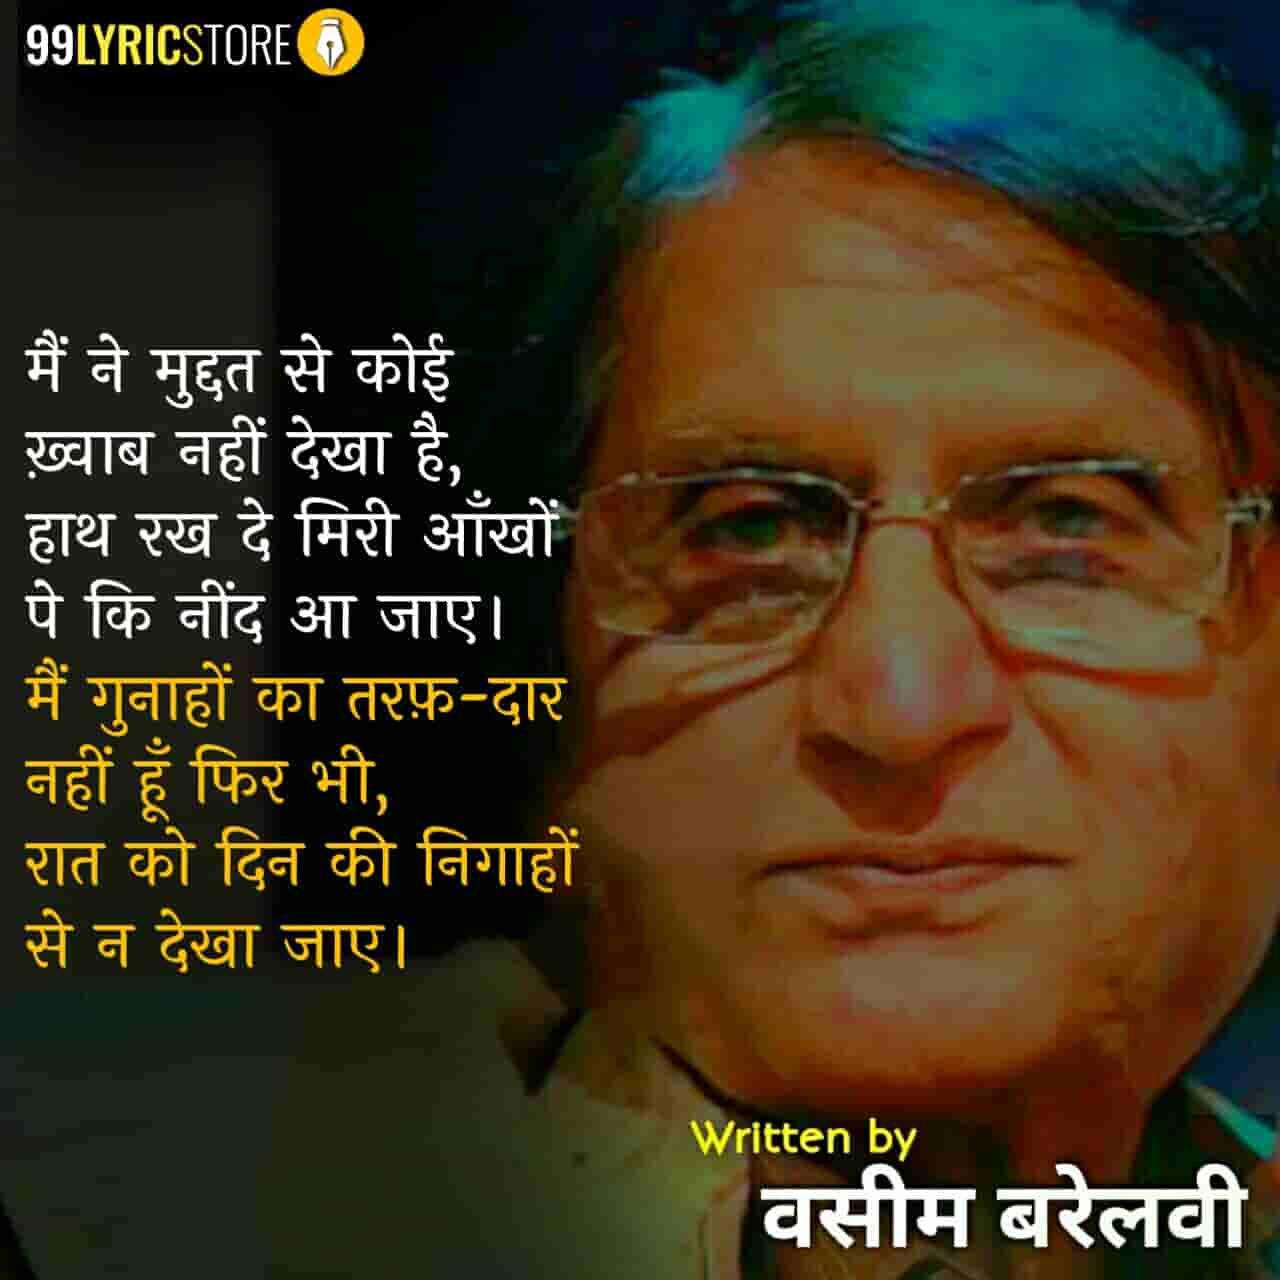 This beautiful ghazal Rang Be-rang Ho Khushboo Ka Bharosa Jaye has written by Waseem Barelvi.